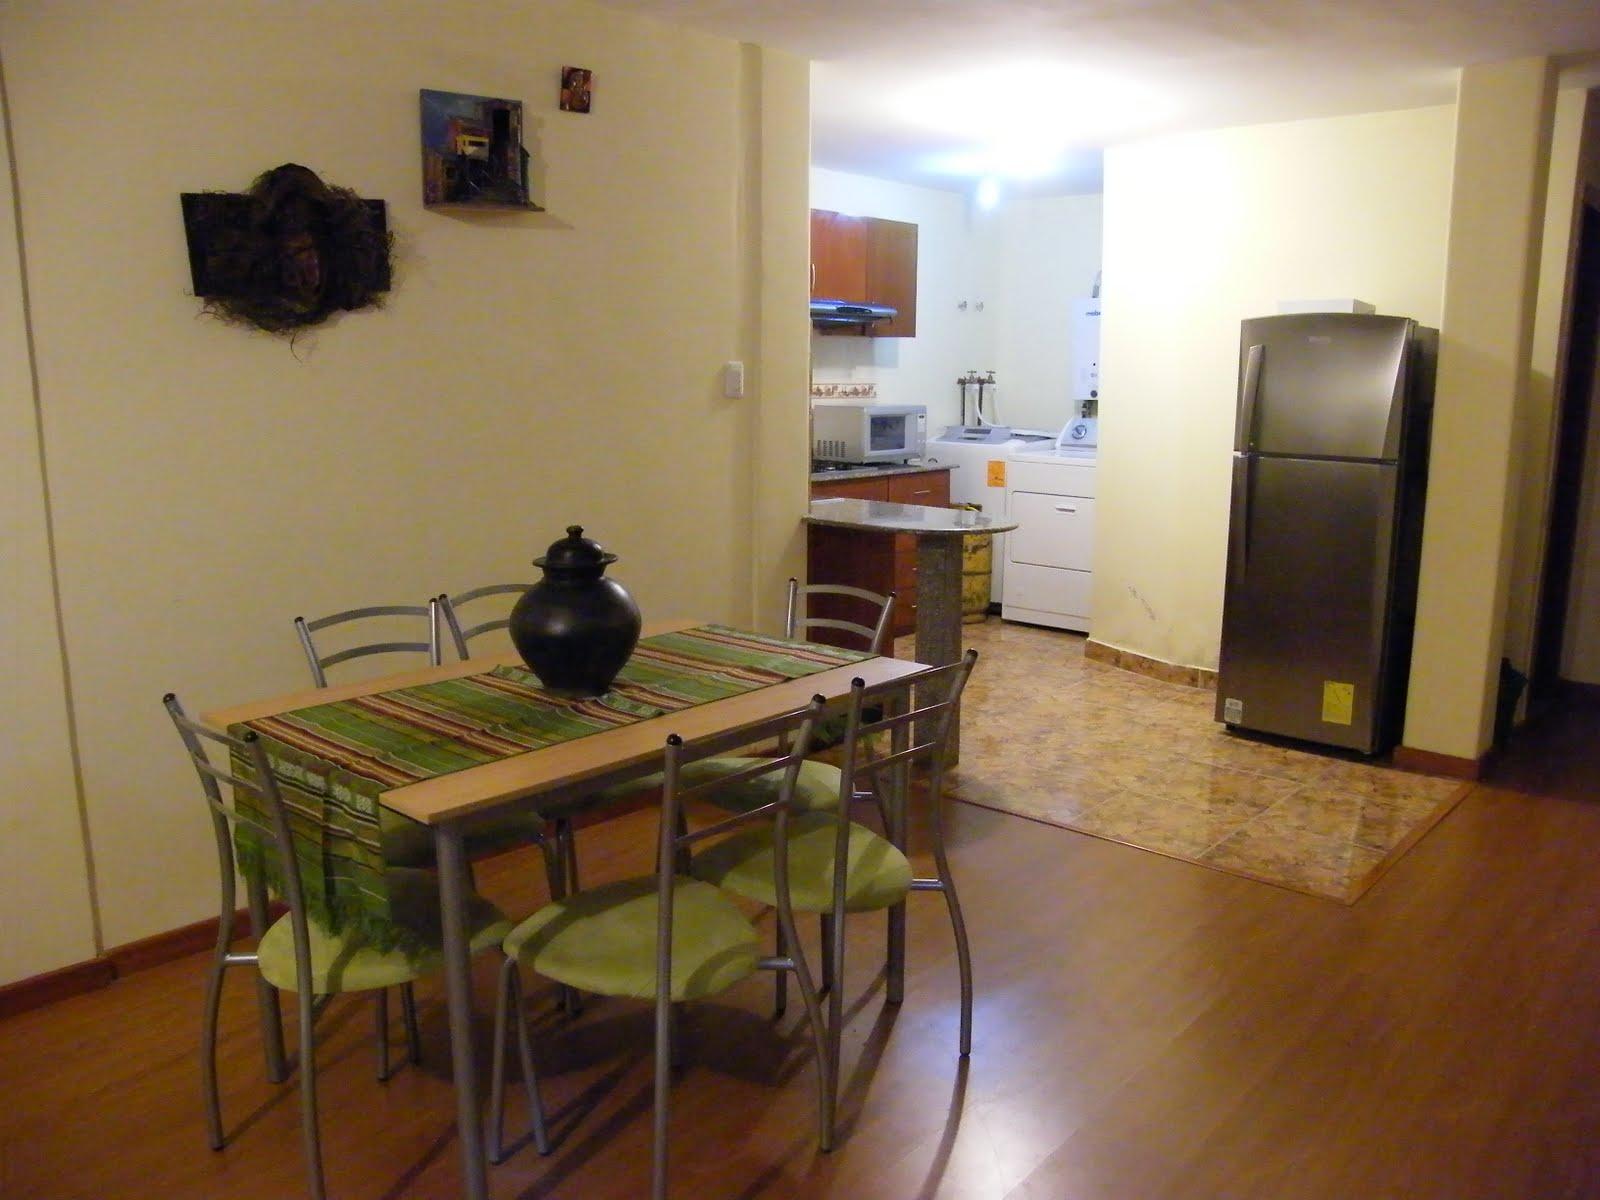 Porque Ecuador OLD Apartment Inside And Outside Views